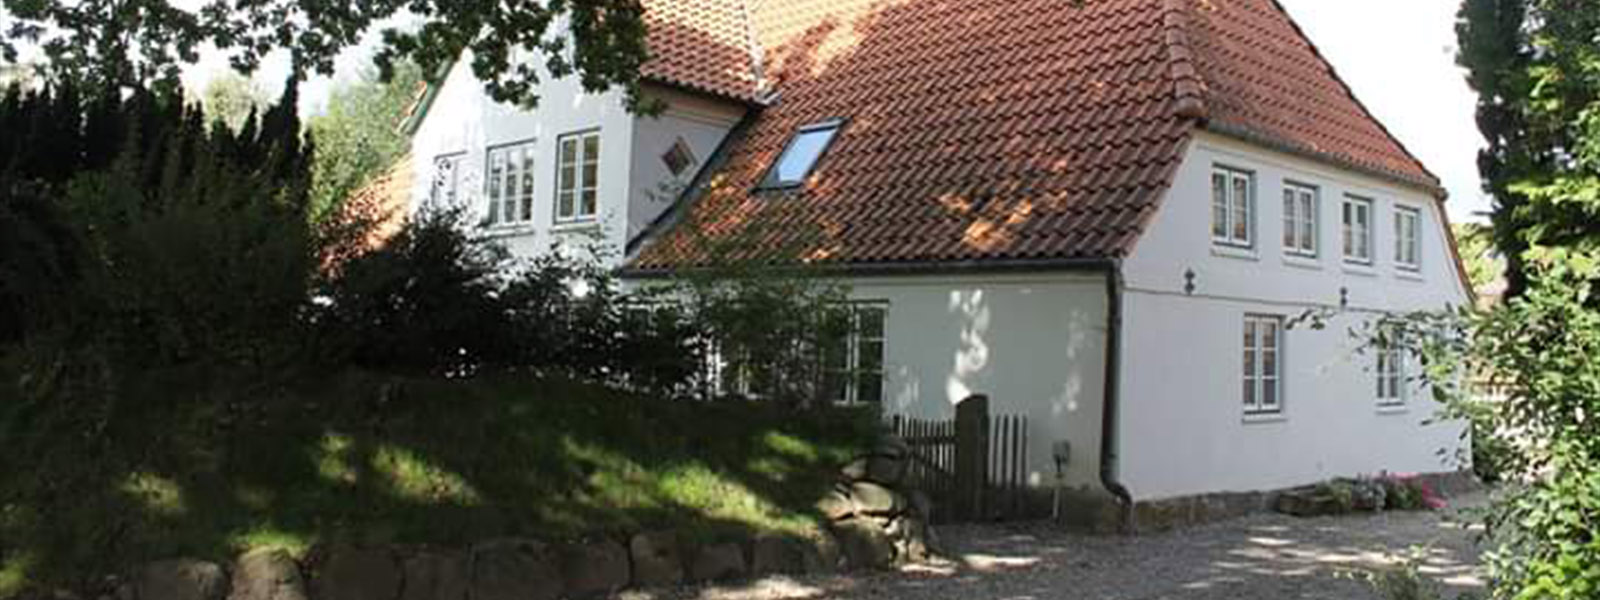 STUDIO GUDRUN BÄR Sommer-Masterclass Gesang 2019 im Ostseehof Langfeld